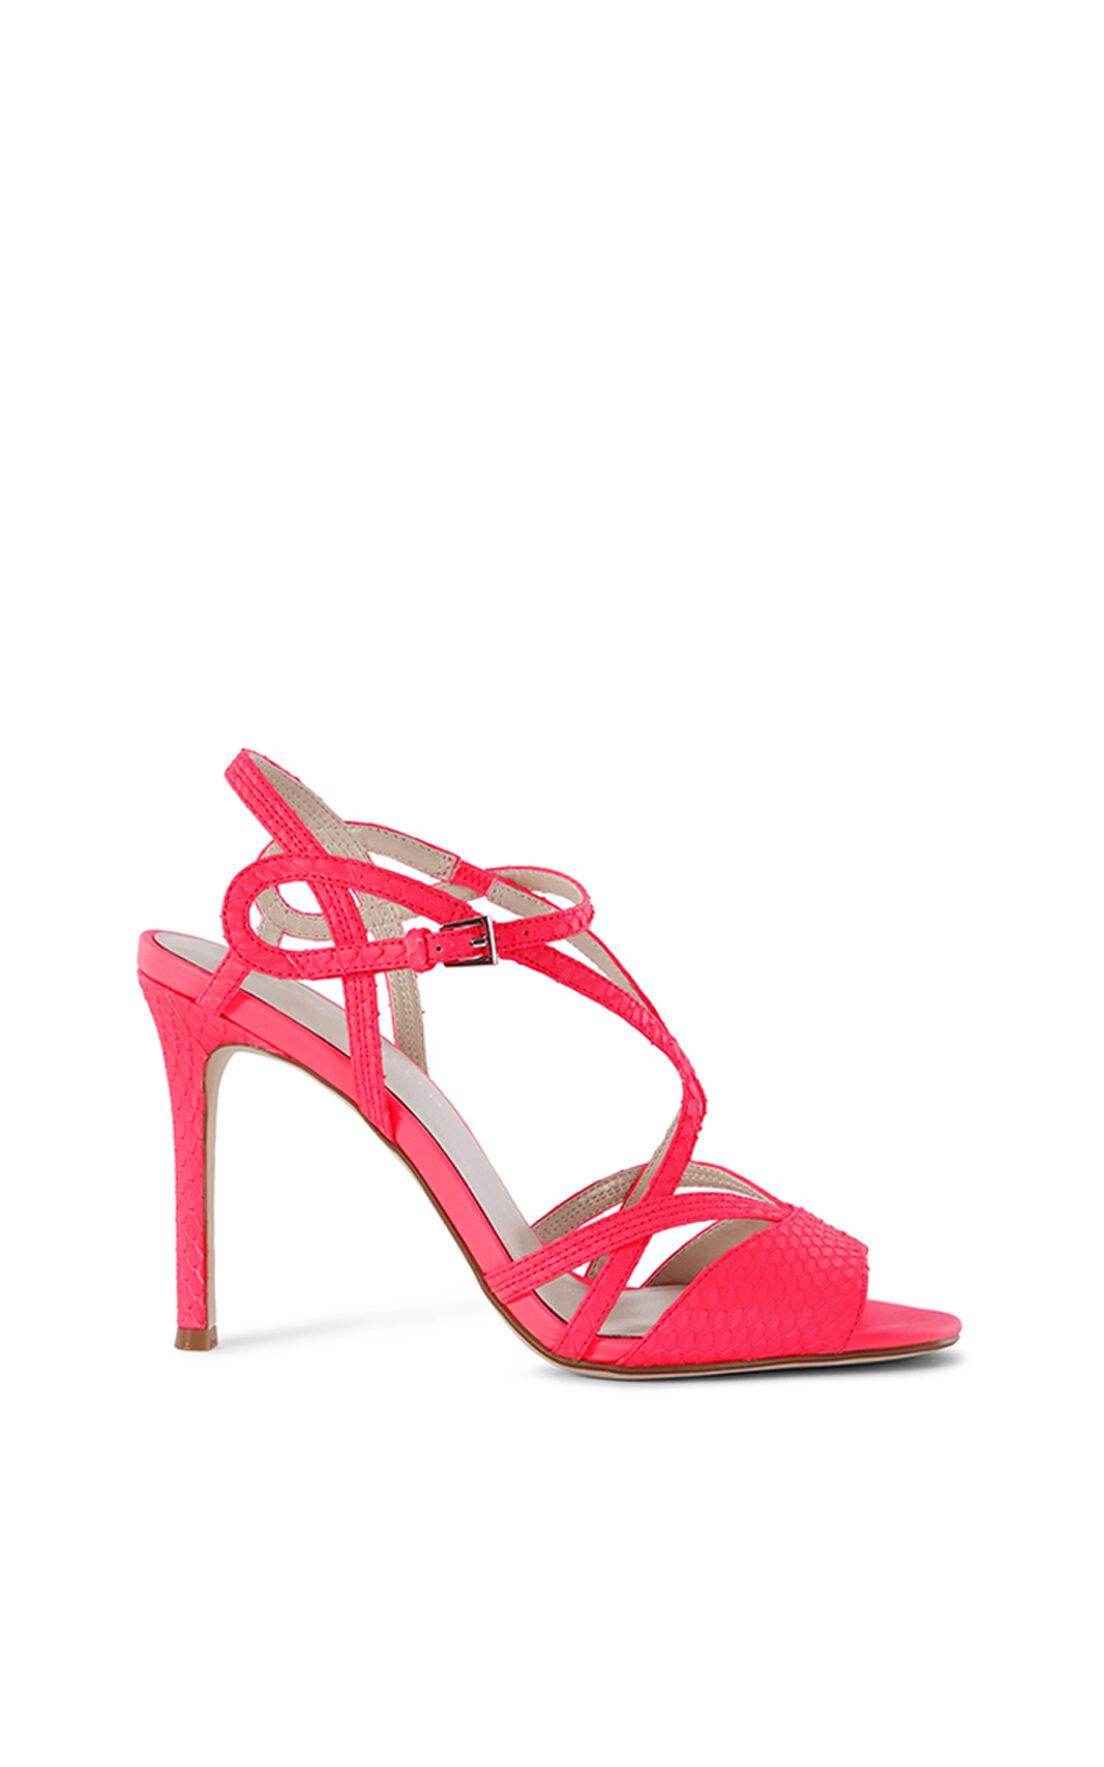 Karen Millen, SNAKE STRAPPY SANDAL Pink 0